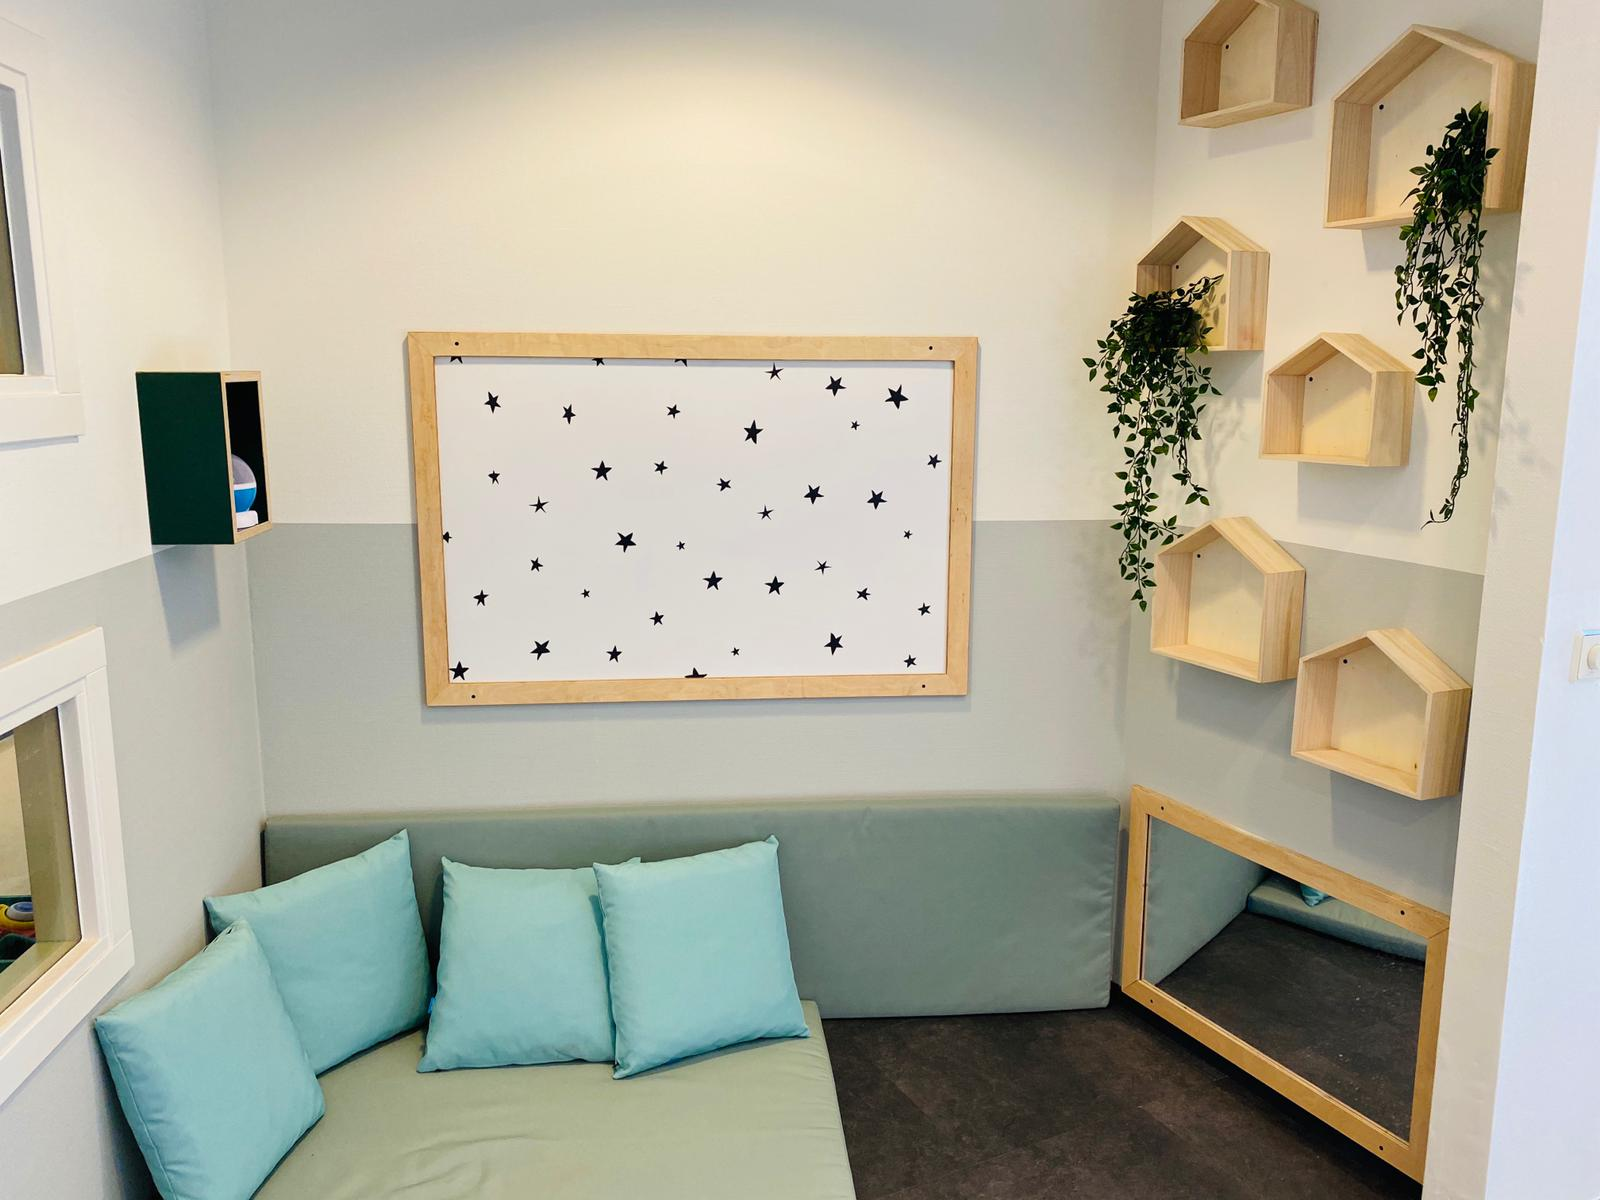 Interieur kindcentrum Jip & Janneke